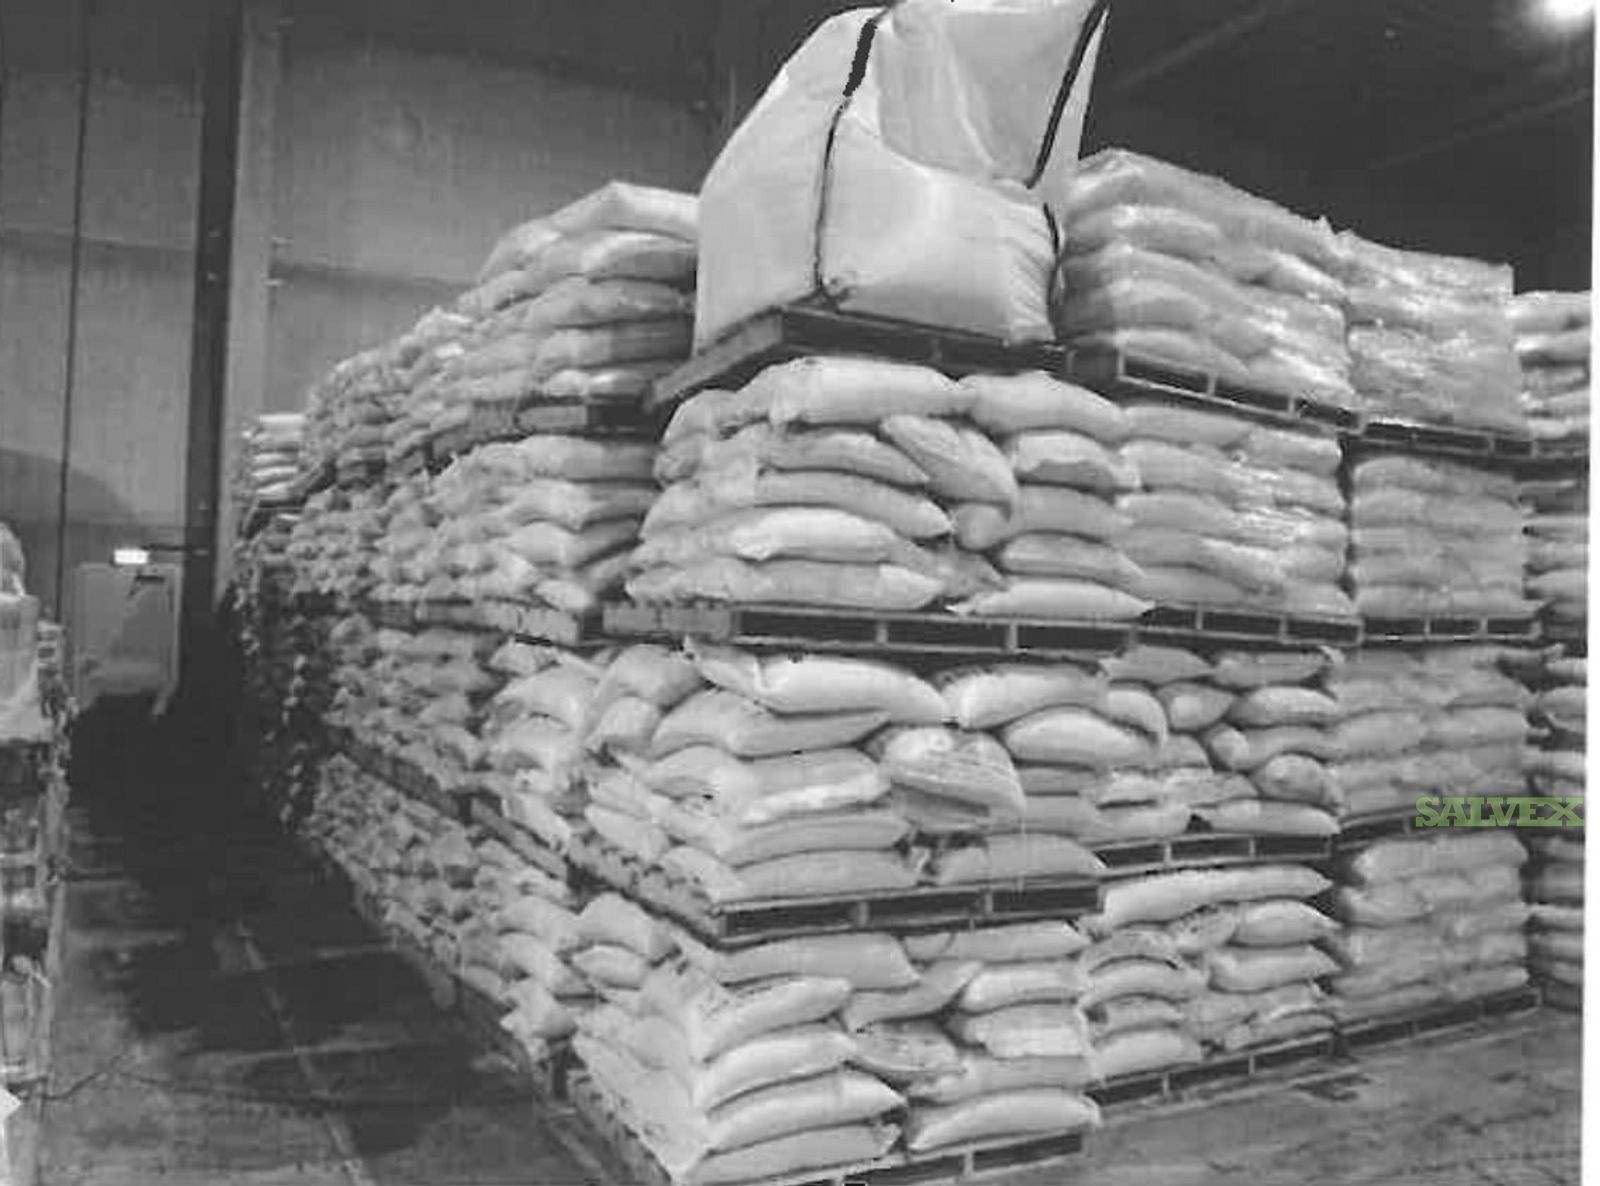 Road Sea Salt (250 Tons)